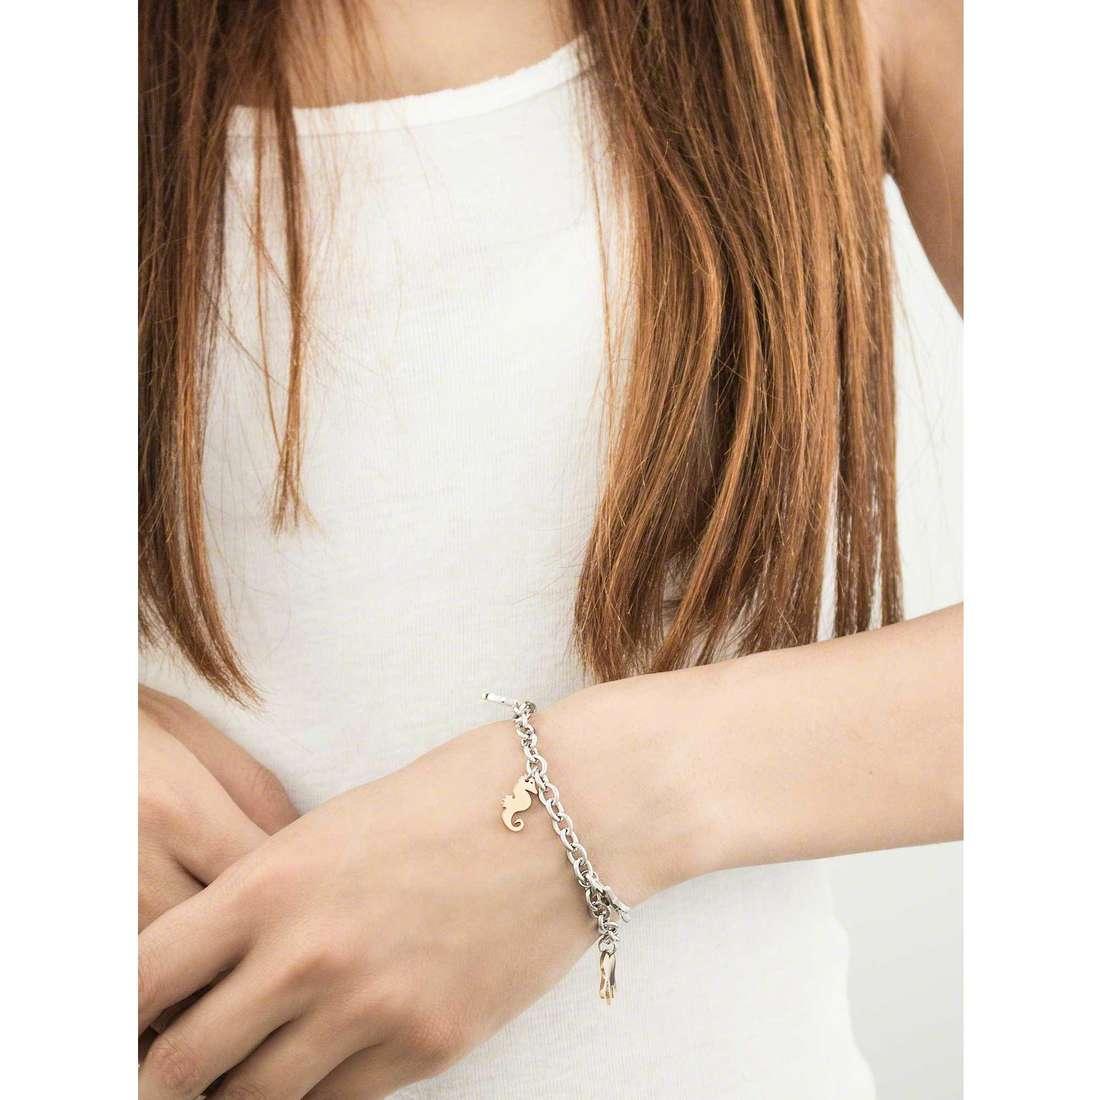 Sector bracciali Nature & Love donna SAGI11 indosso